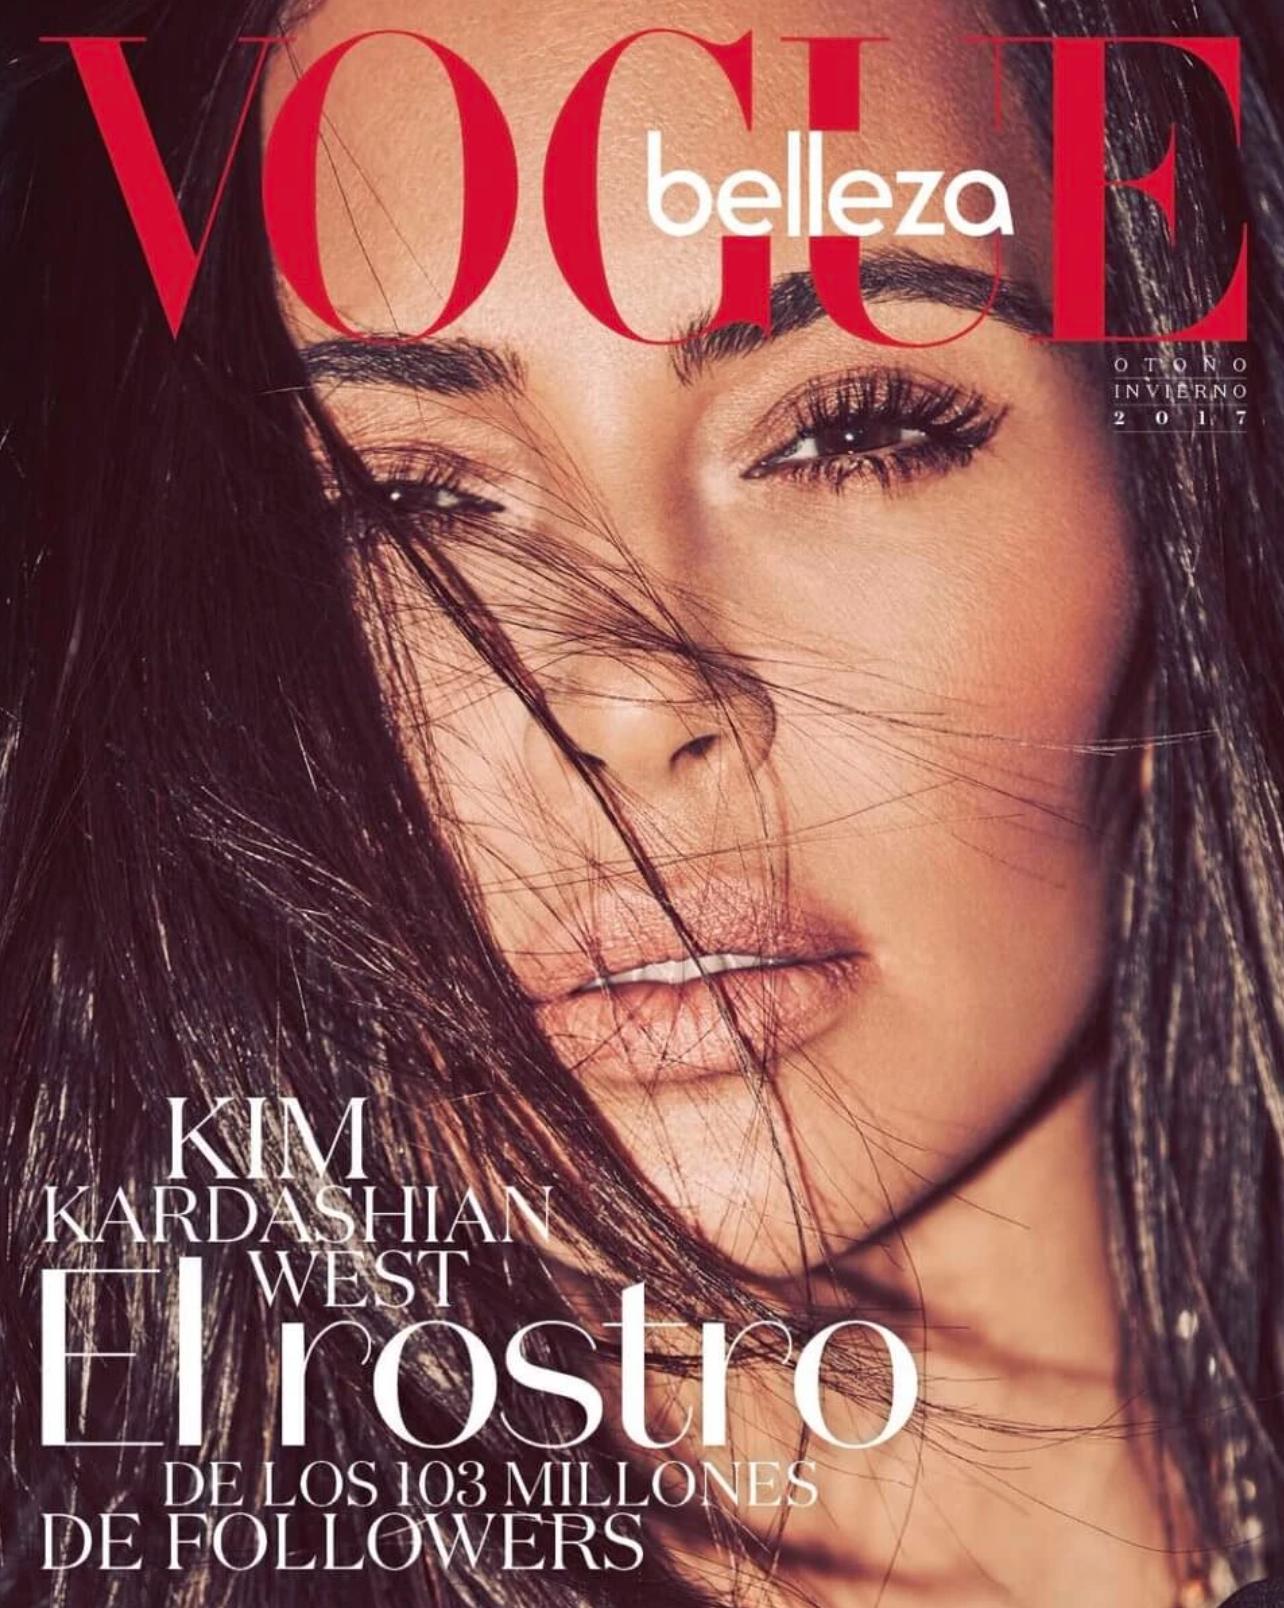 Kim Kardashian for Vogue Mexico